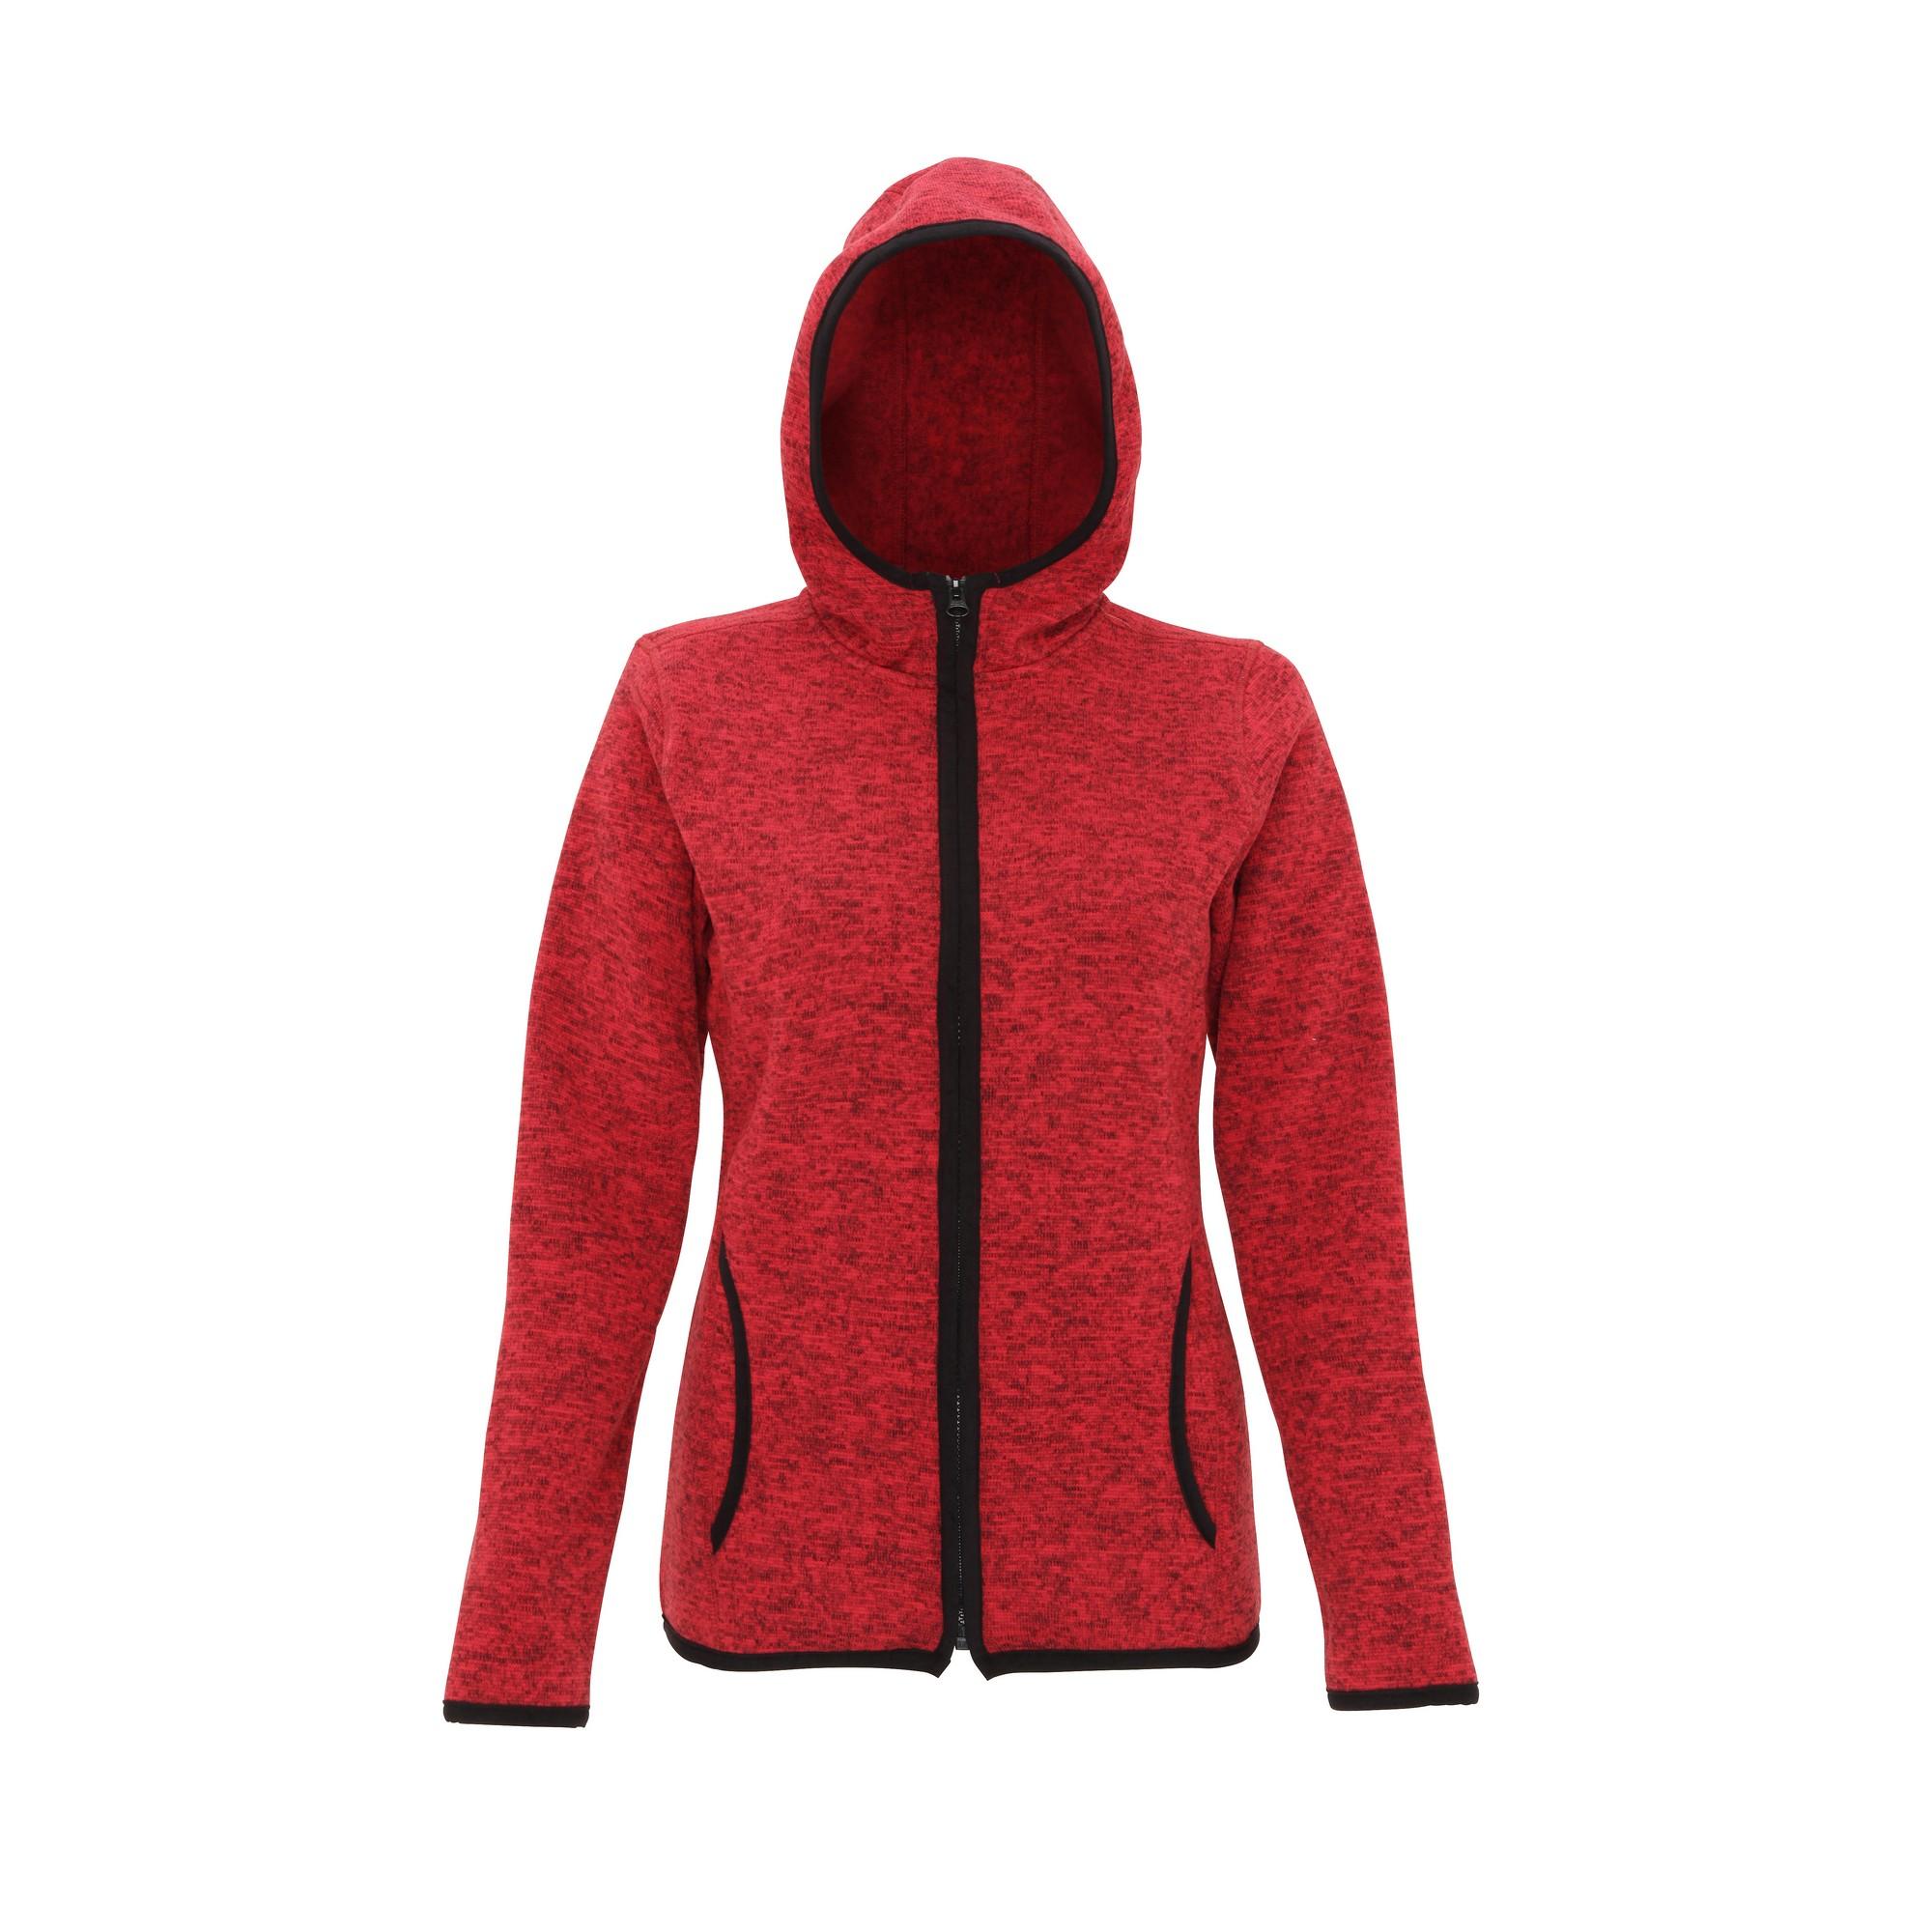 Tri Dri Womens/Ladies Melange Knit Fleece Jacket (XL) (Fire Red/Black Fleck)